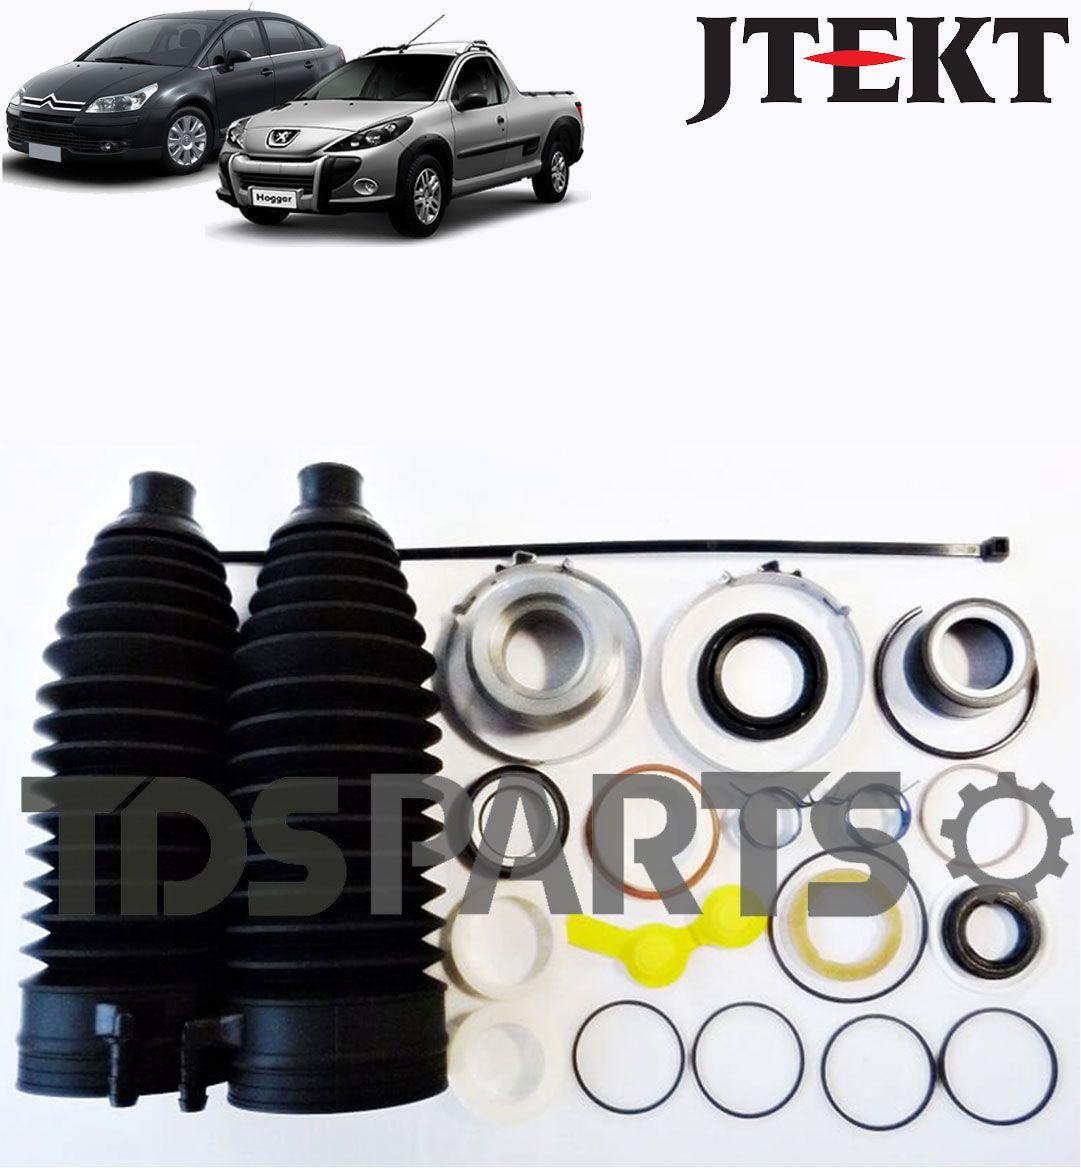 Reparo Caixa De Direção Hidráulica Original Peugeot 206 | 207 | Hoggar | C4 Pallas | C4 Hatch